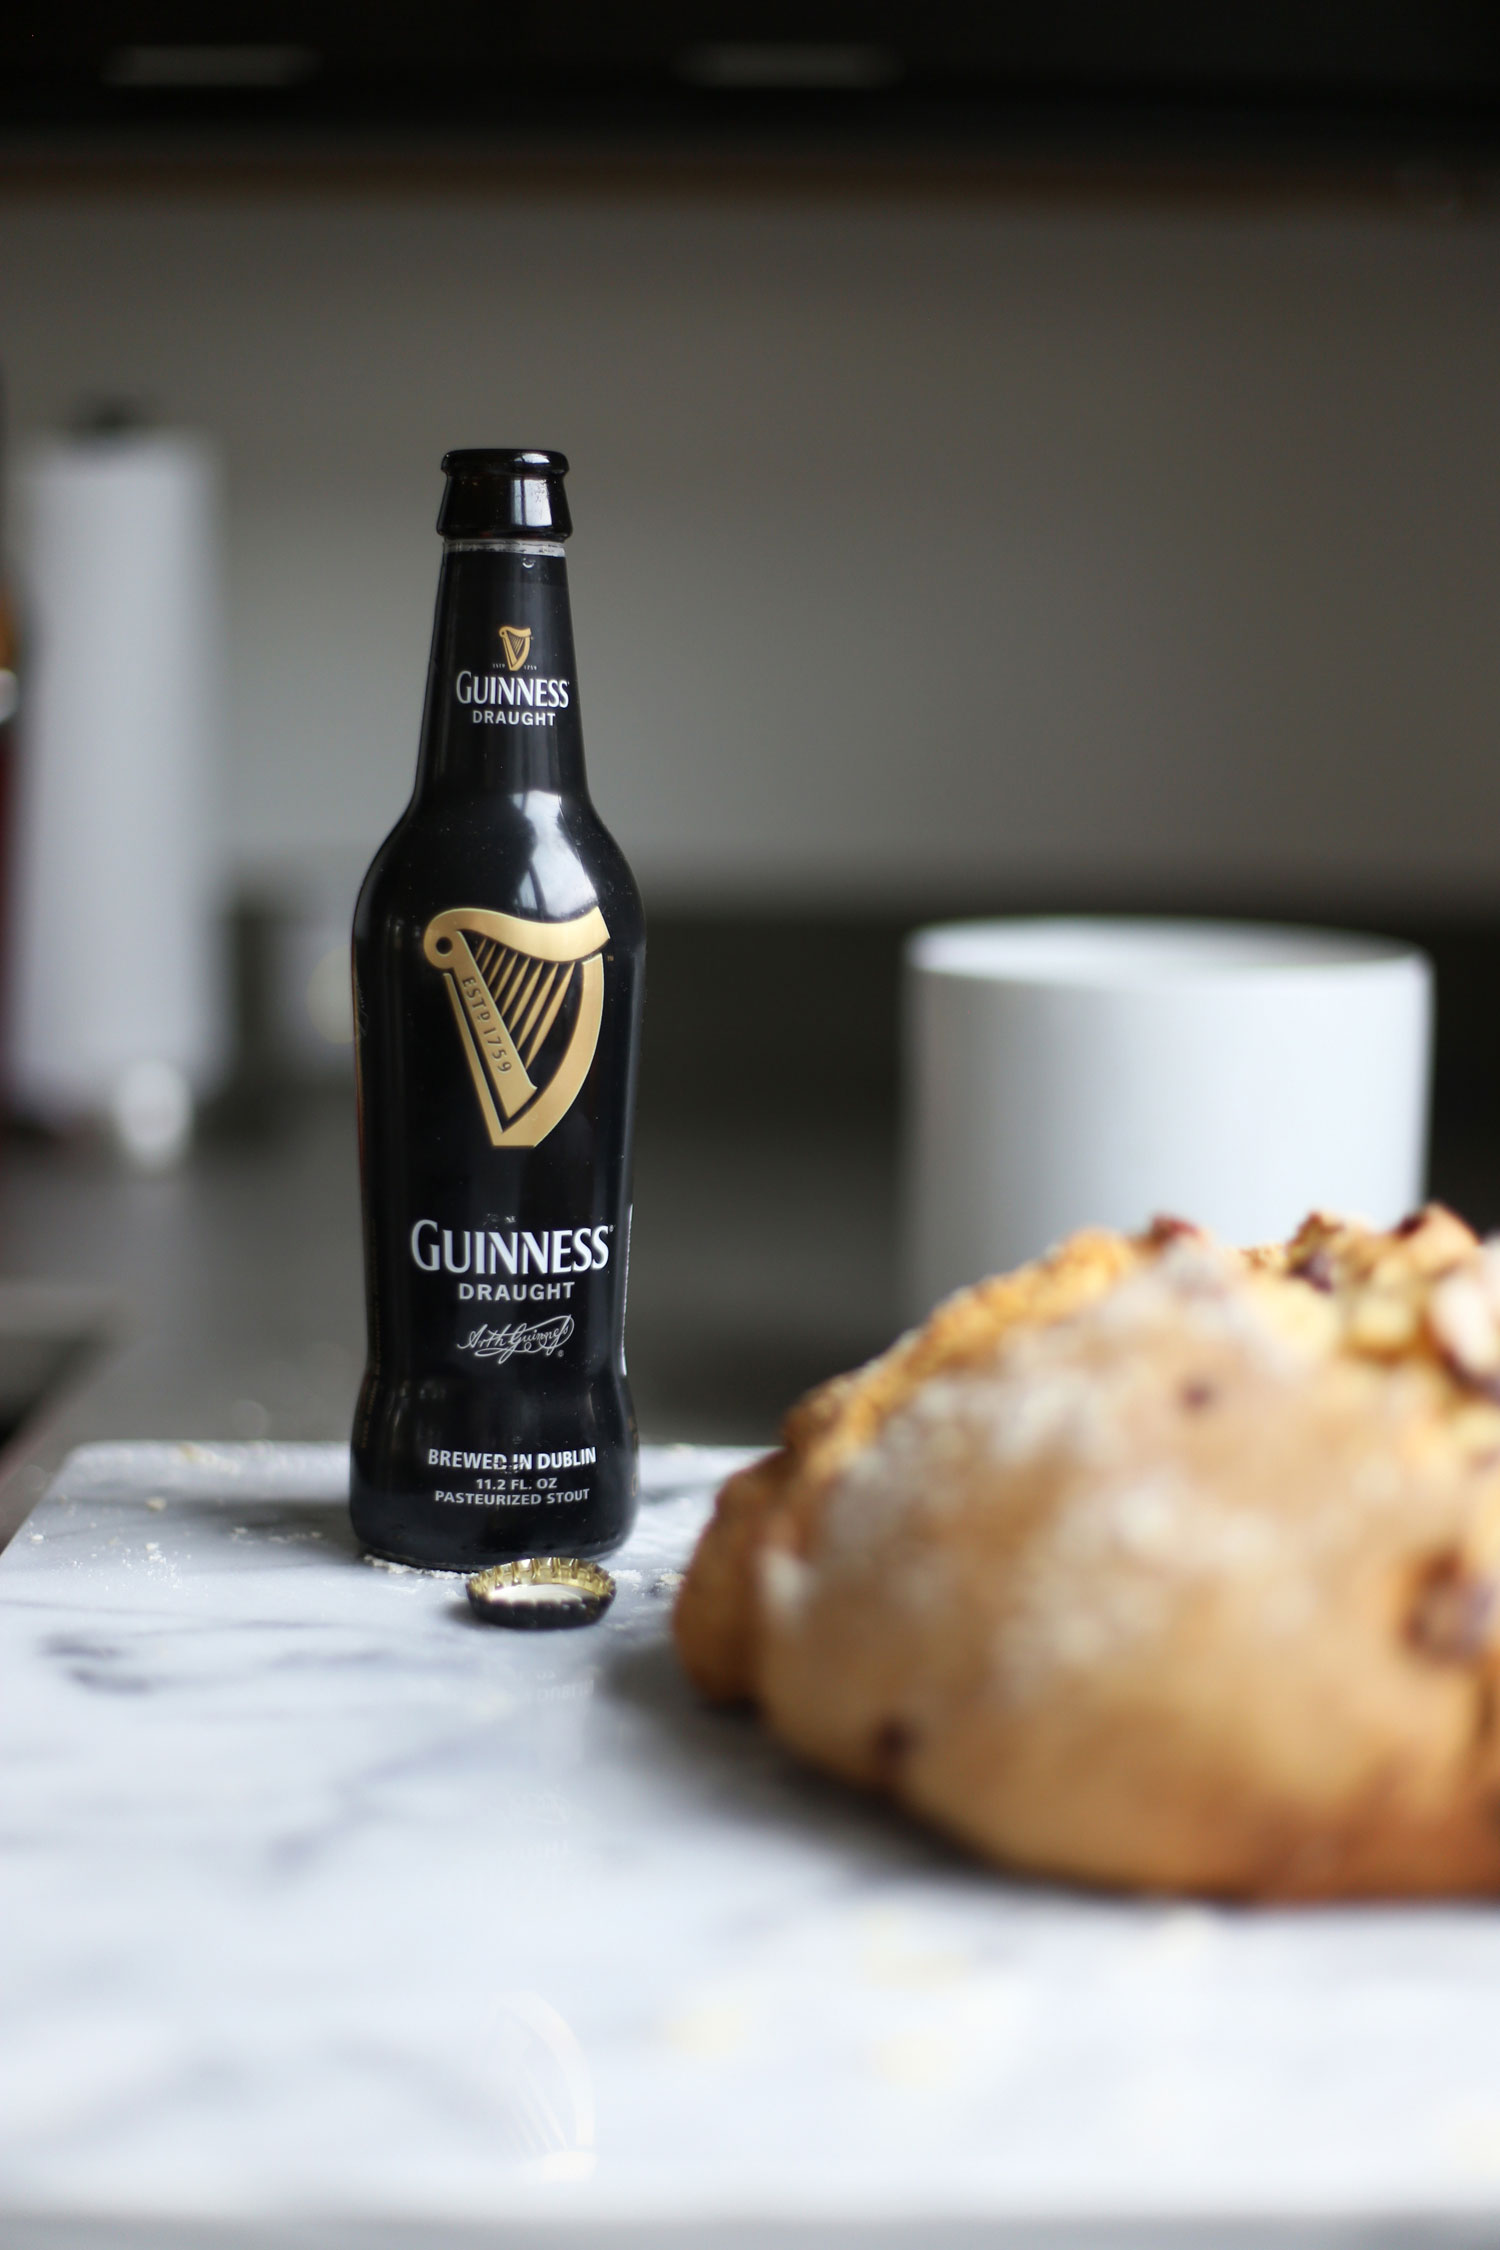 sweet Irish Soda Bread and Guinness